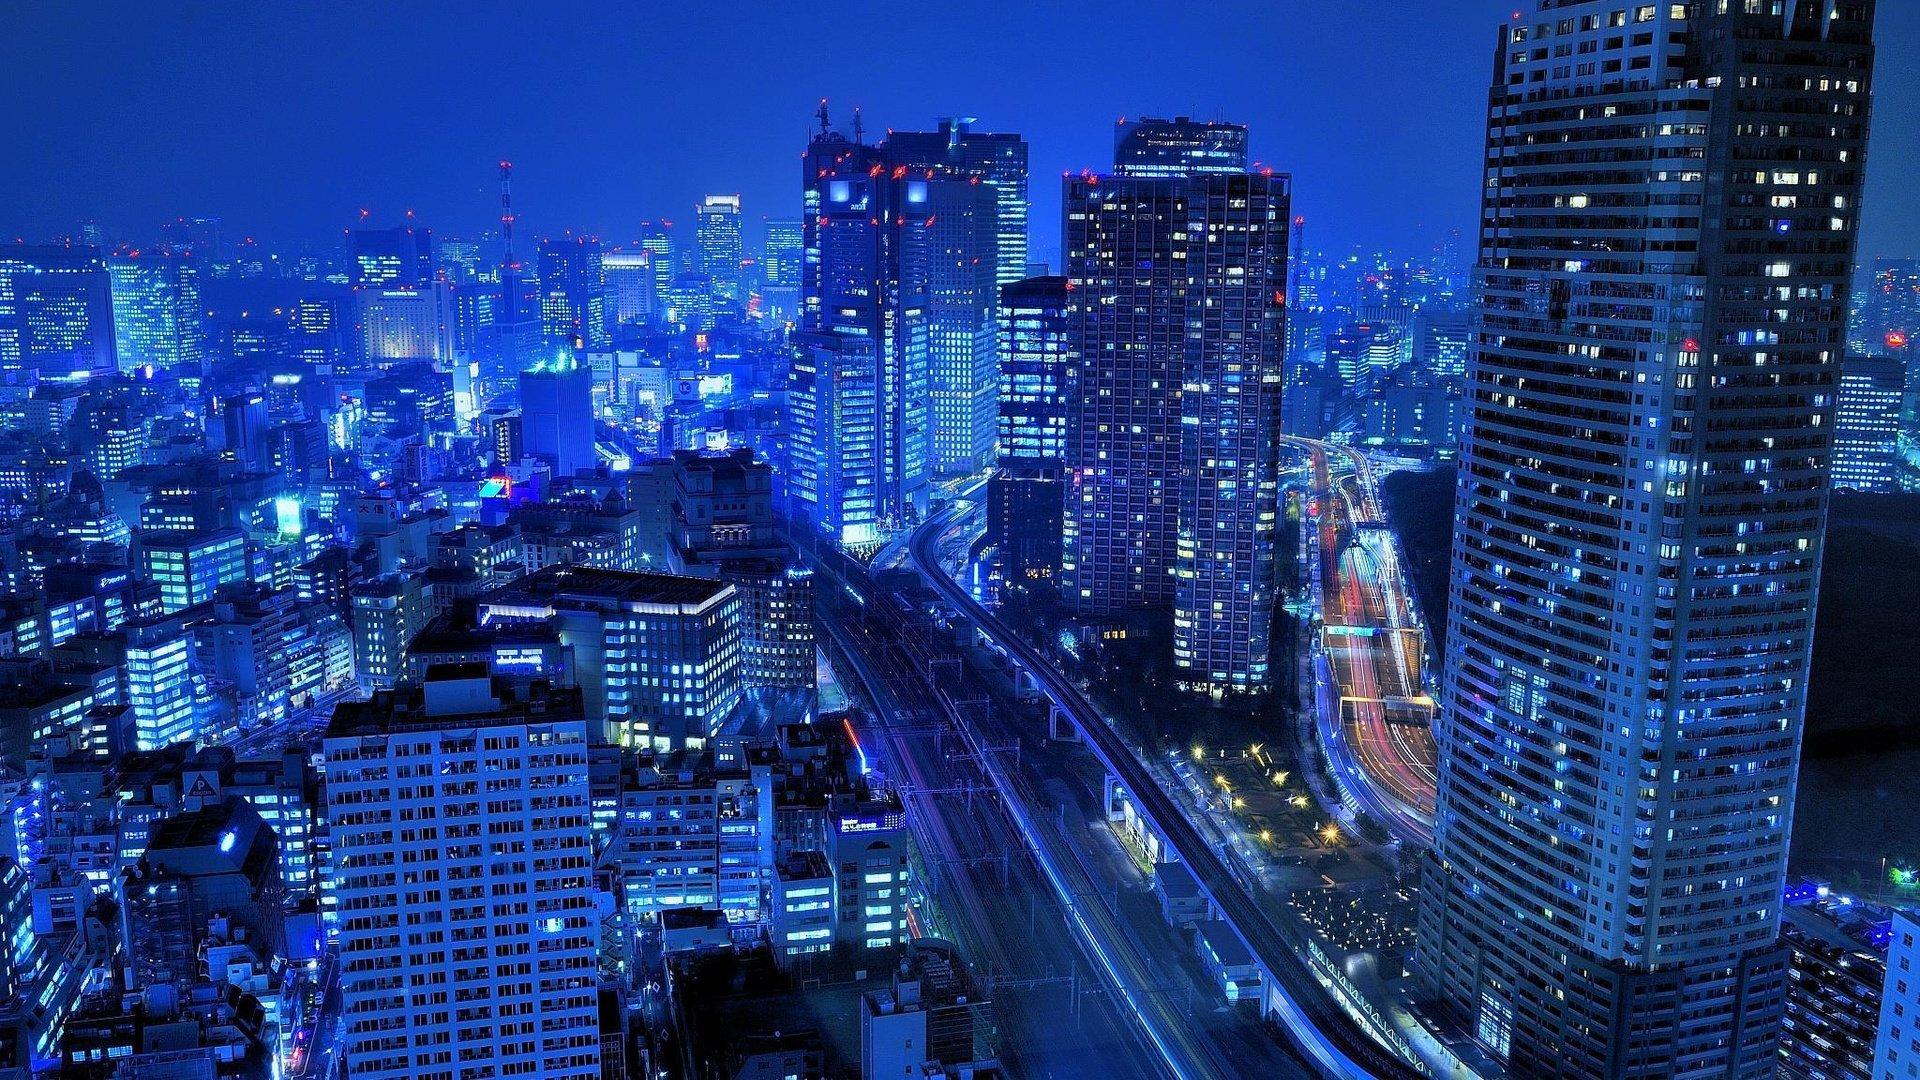 night, city, building без смс